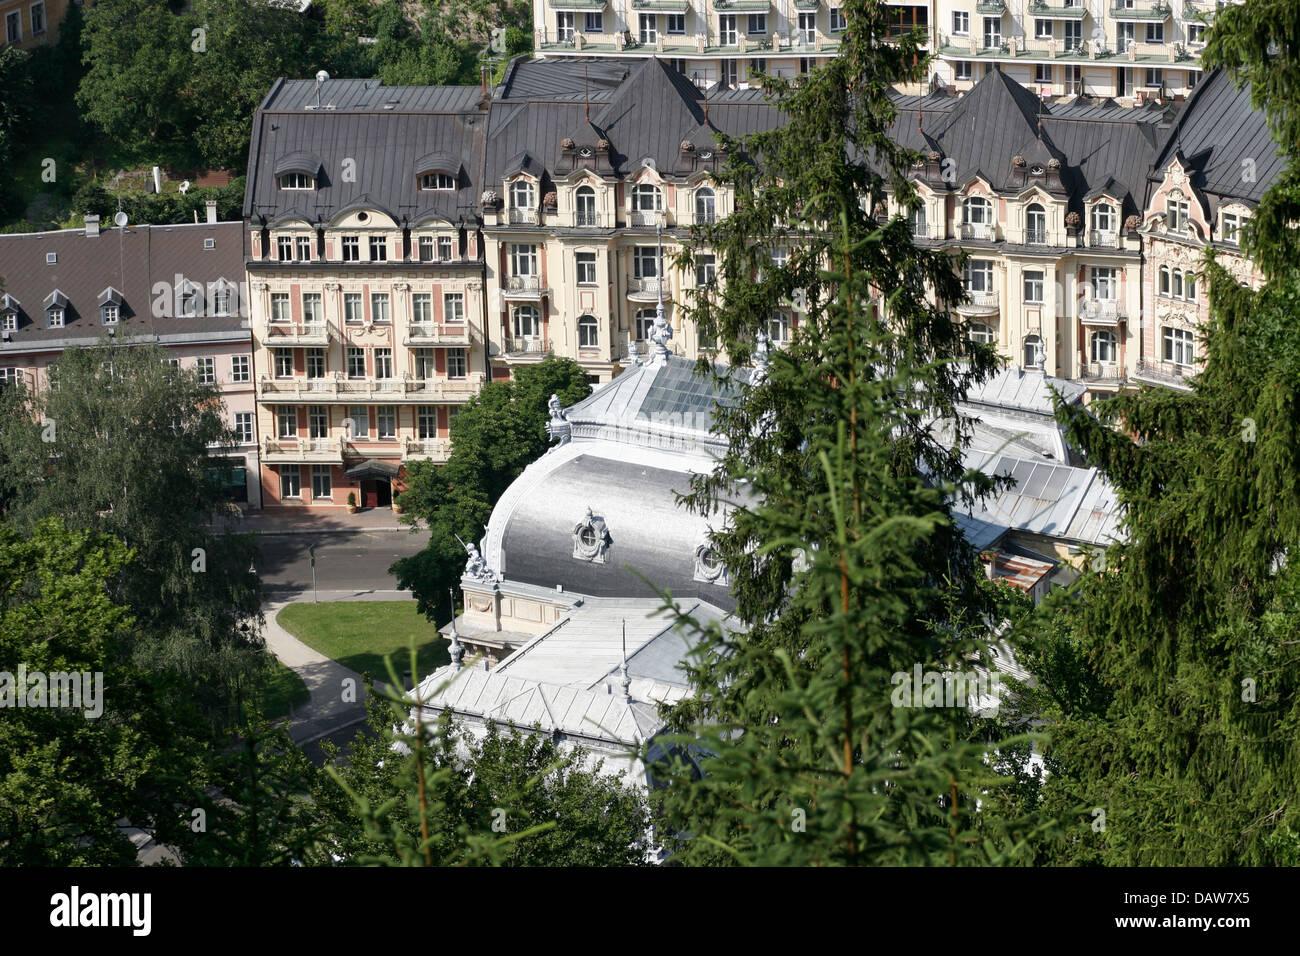 Panoramic view of Cisarske Lazne (Lazne I), Karlovy Vary from above, Czech Republic - Stock Image